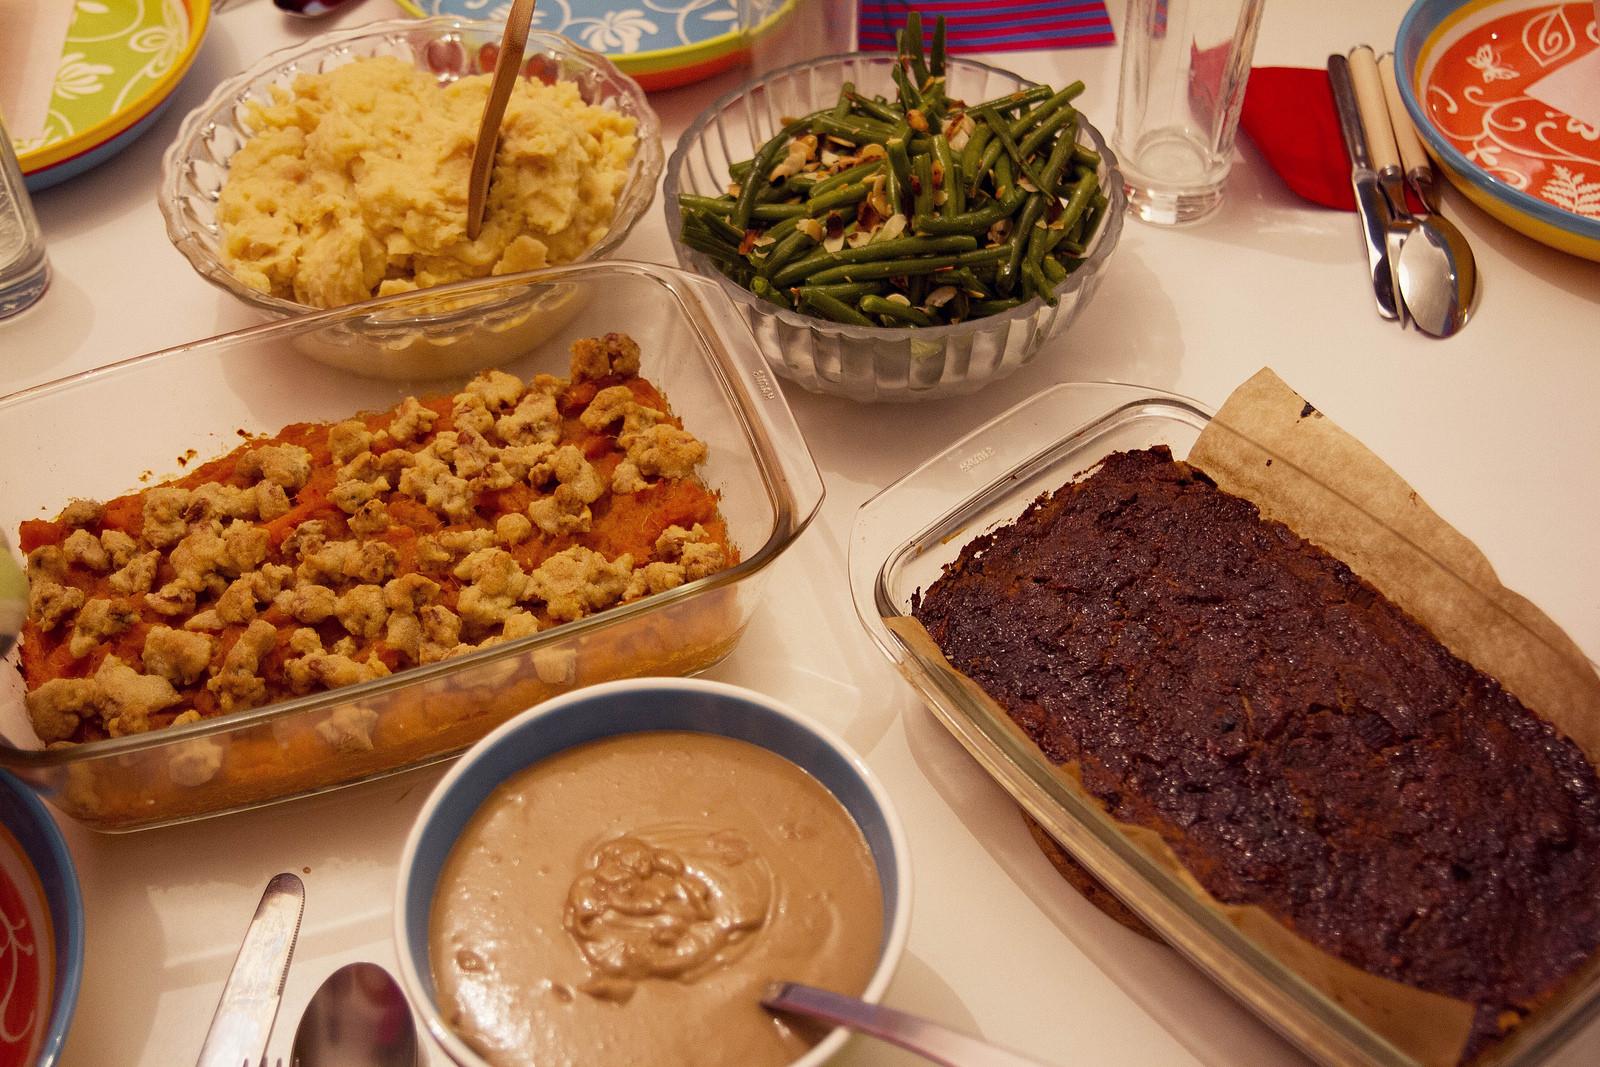 Vegan Thanksgiving Menu Ideas  Vegan Thanksgiving 2012 and Christmas Menu Ideas heylilahey